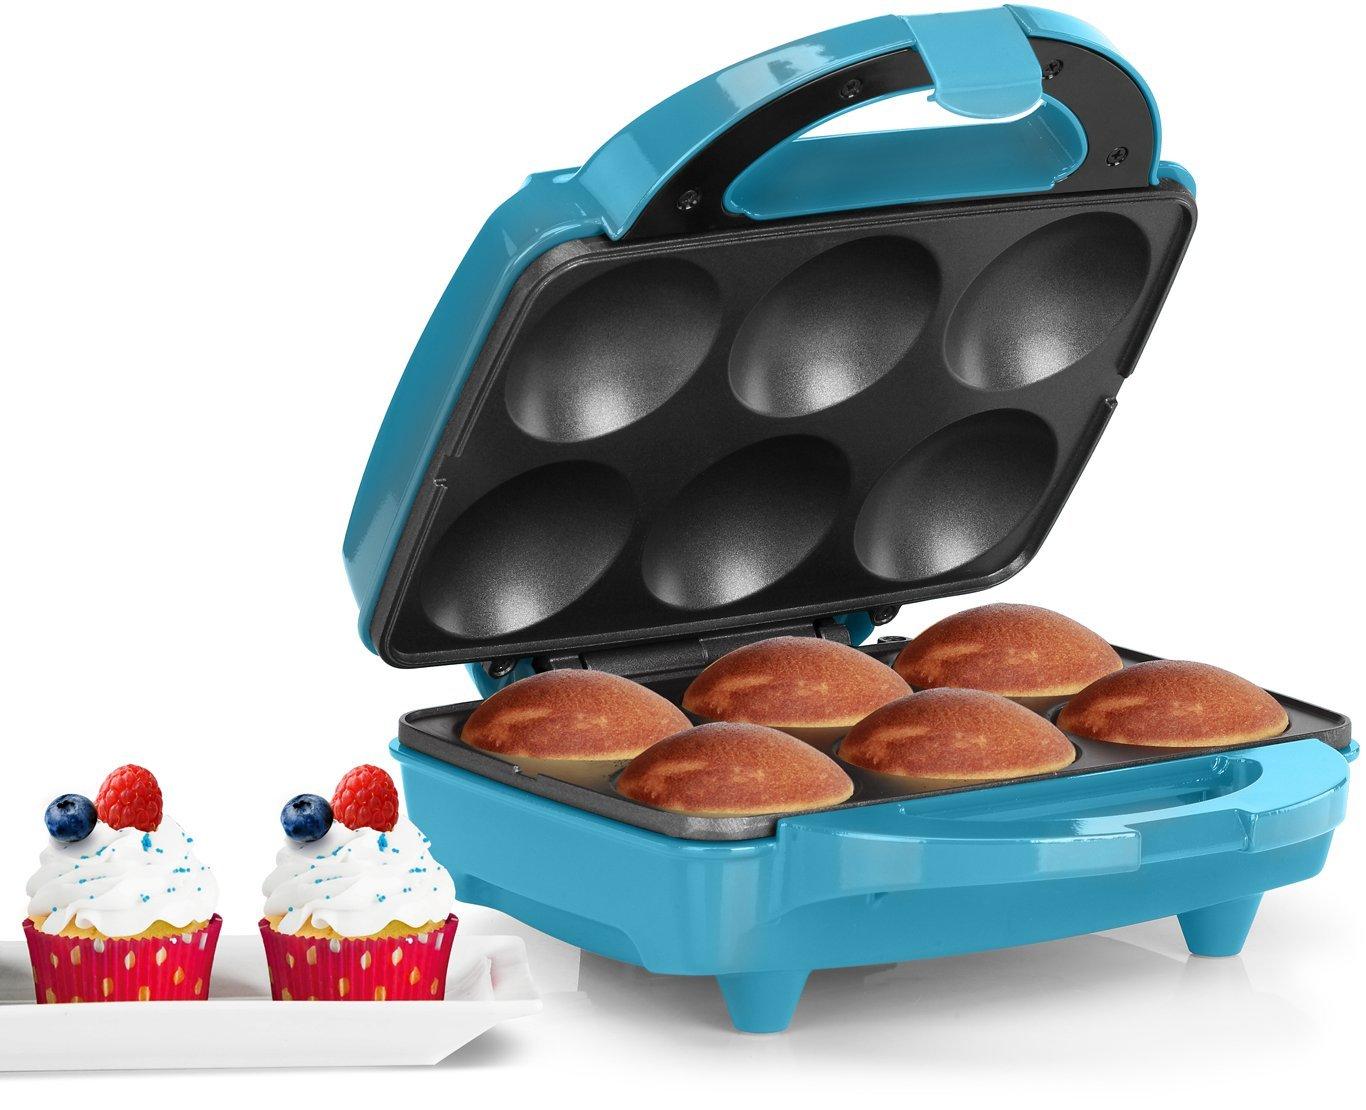 Holstein Housewares HF-09013T Fun Cupcake Maker - Teal/Stainless Steel by Holstein Housewares